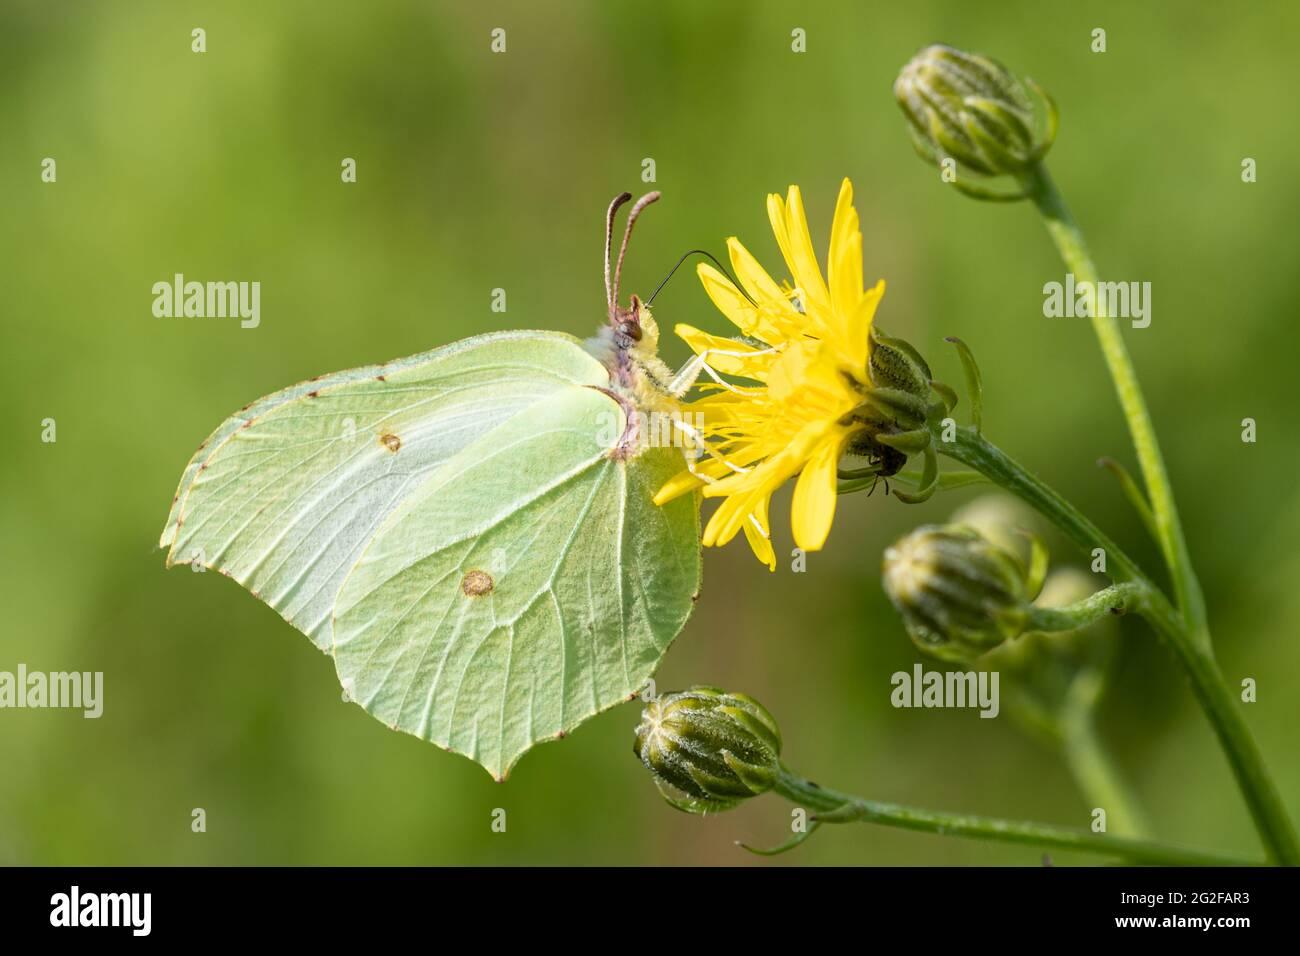 Brimstone butterfly (Gonepteryx rhamni) feeding on hawkbit wildflower during summer, UK Stock Photo